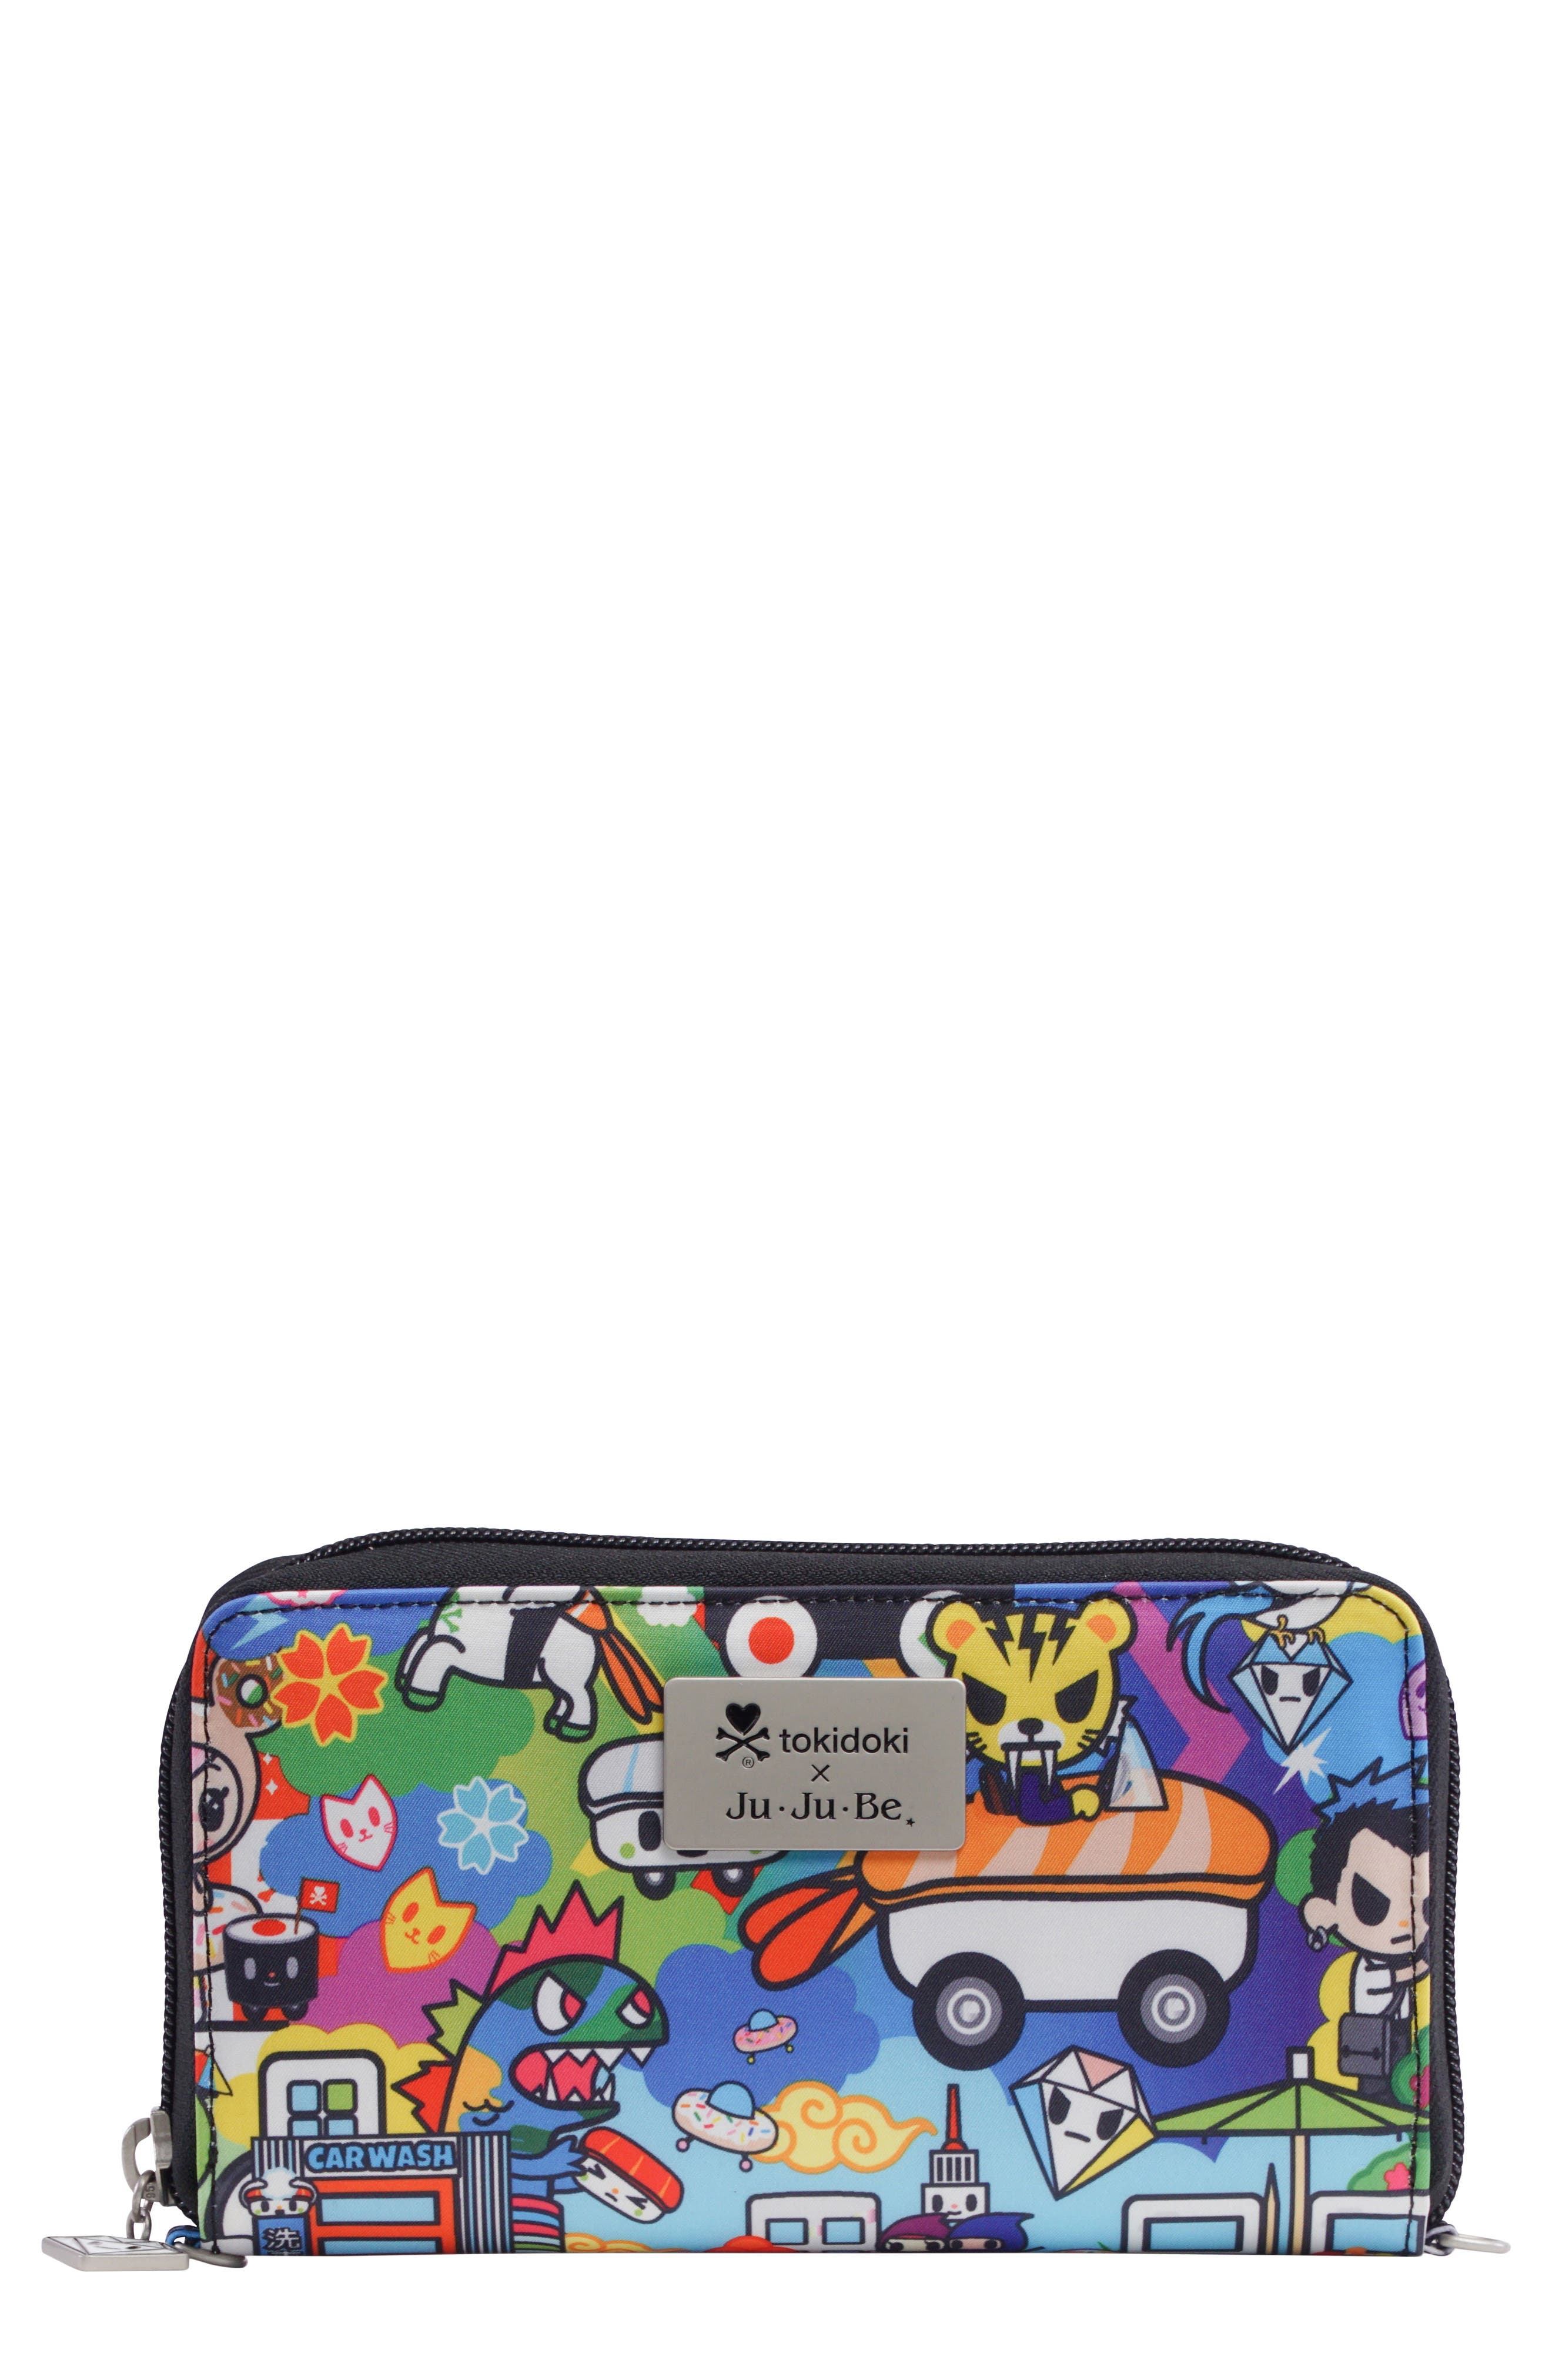 x tokidoki Be Spendy Clutch Wallet,                             Main thumbnail 1, color,                             100